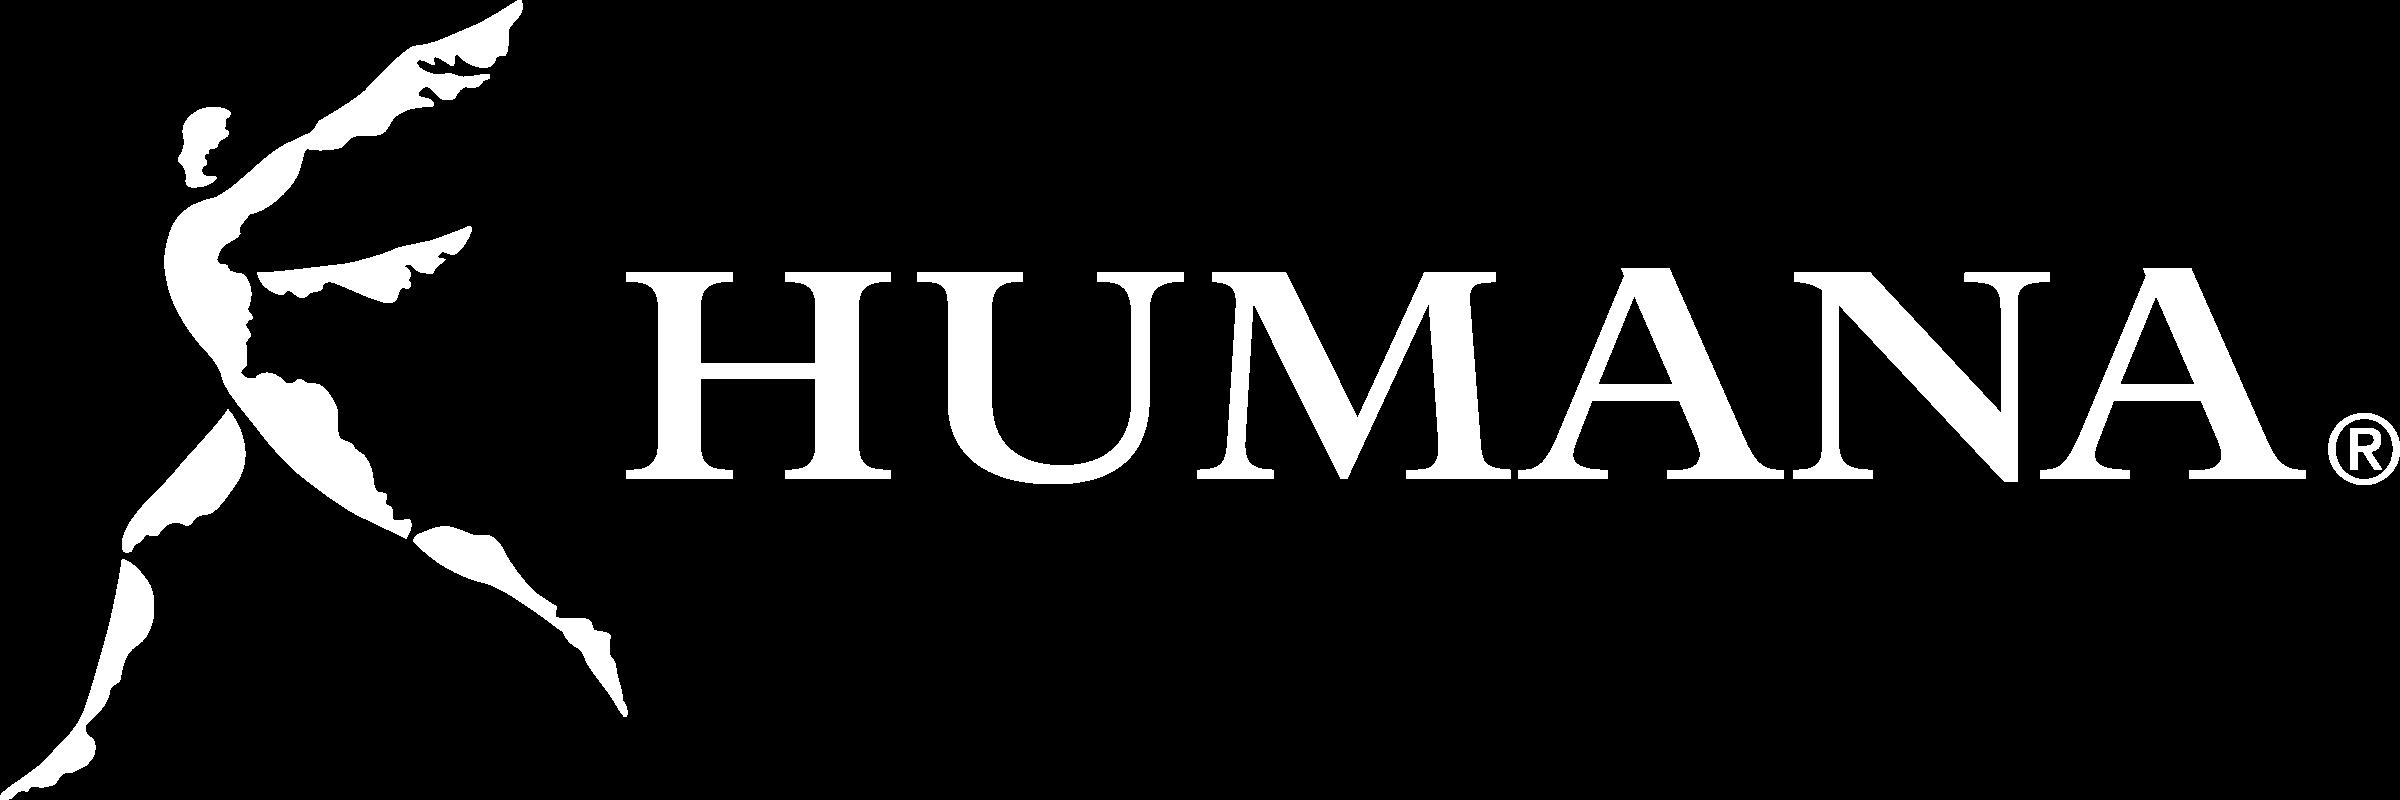 Humana 1 Logo PNG Transparent & SVG Vector.